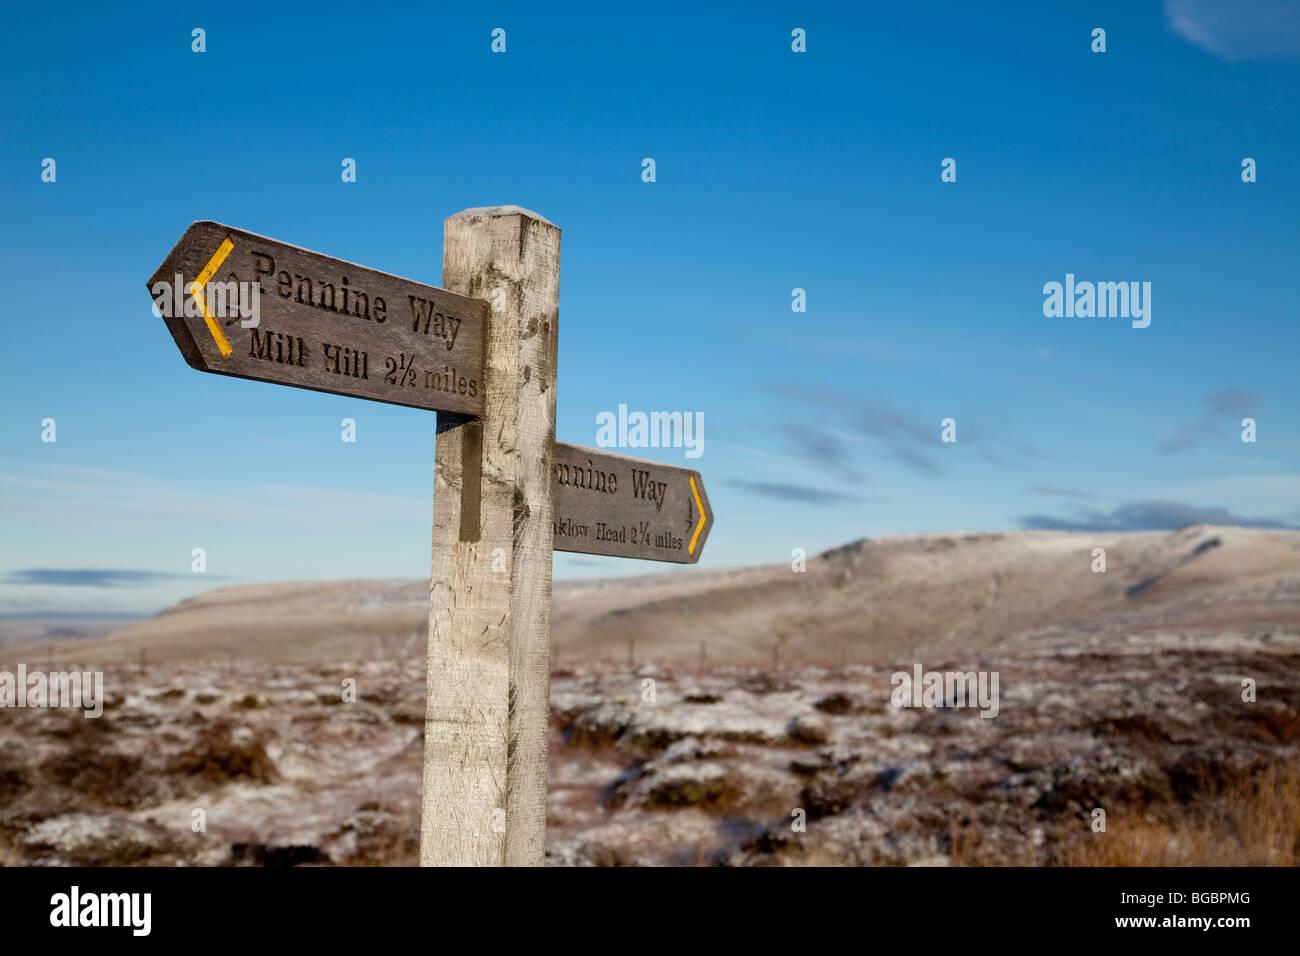 Pennine Way signpost on A57, Snake Pass - Stock Image